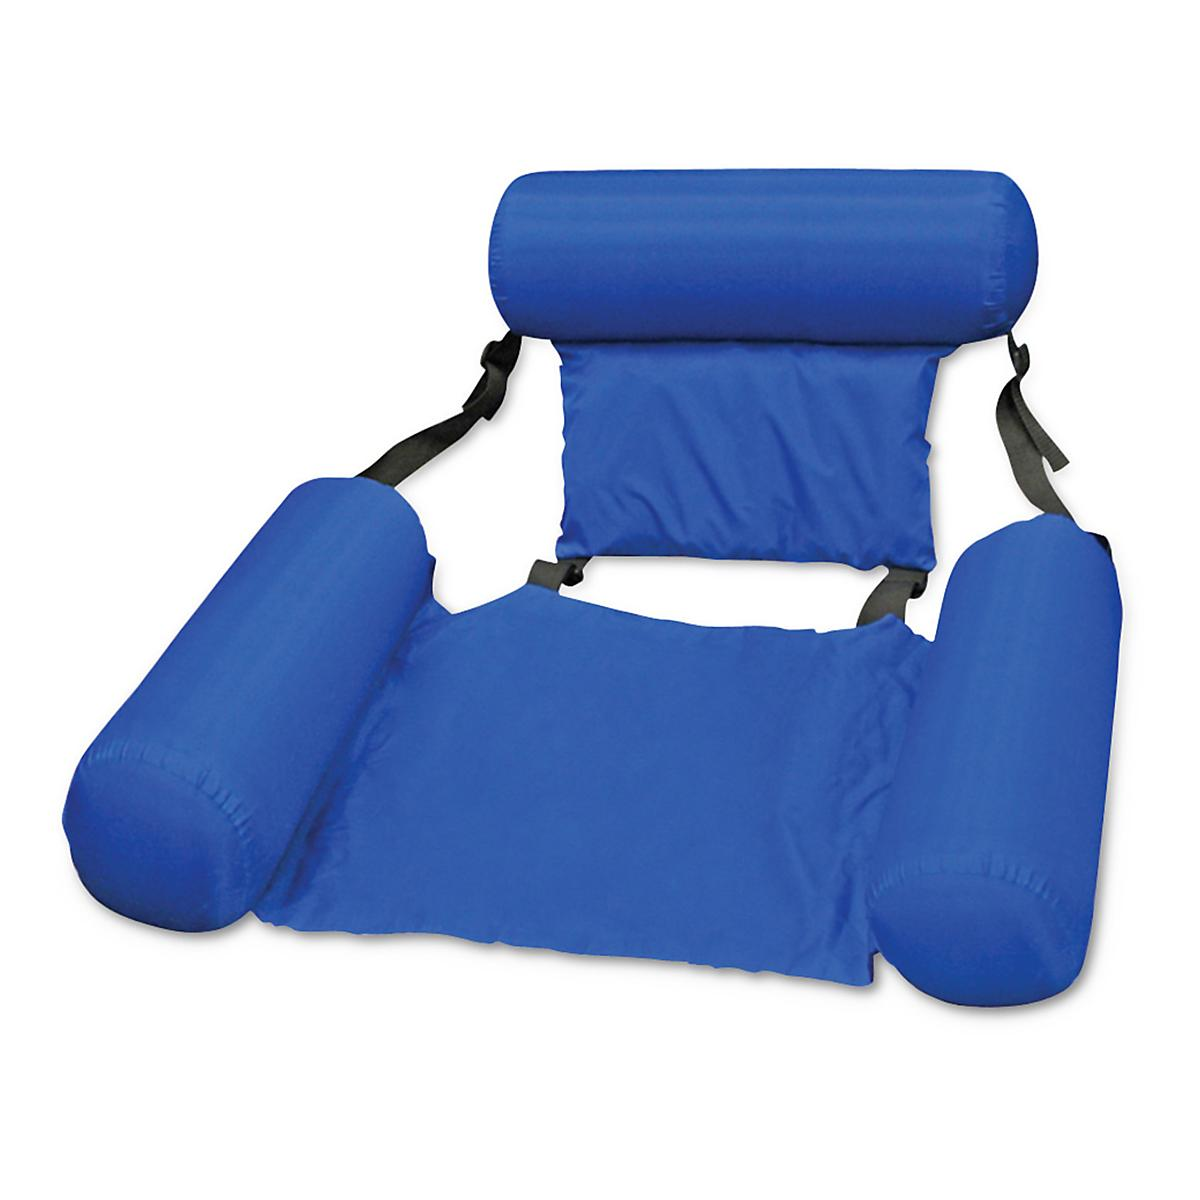 Poolmaster�Water Chair Lounger